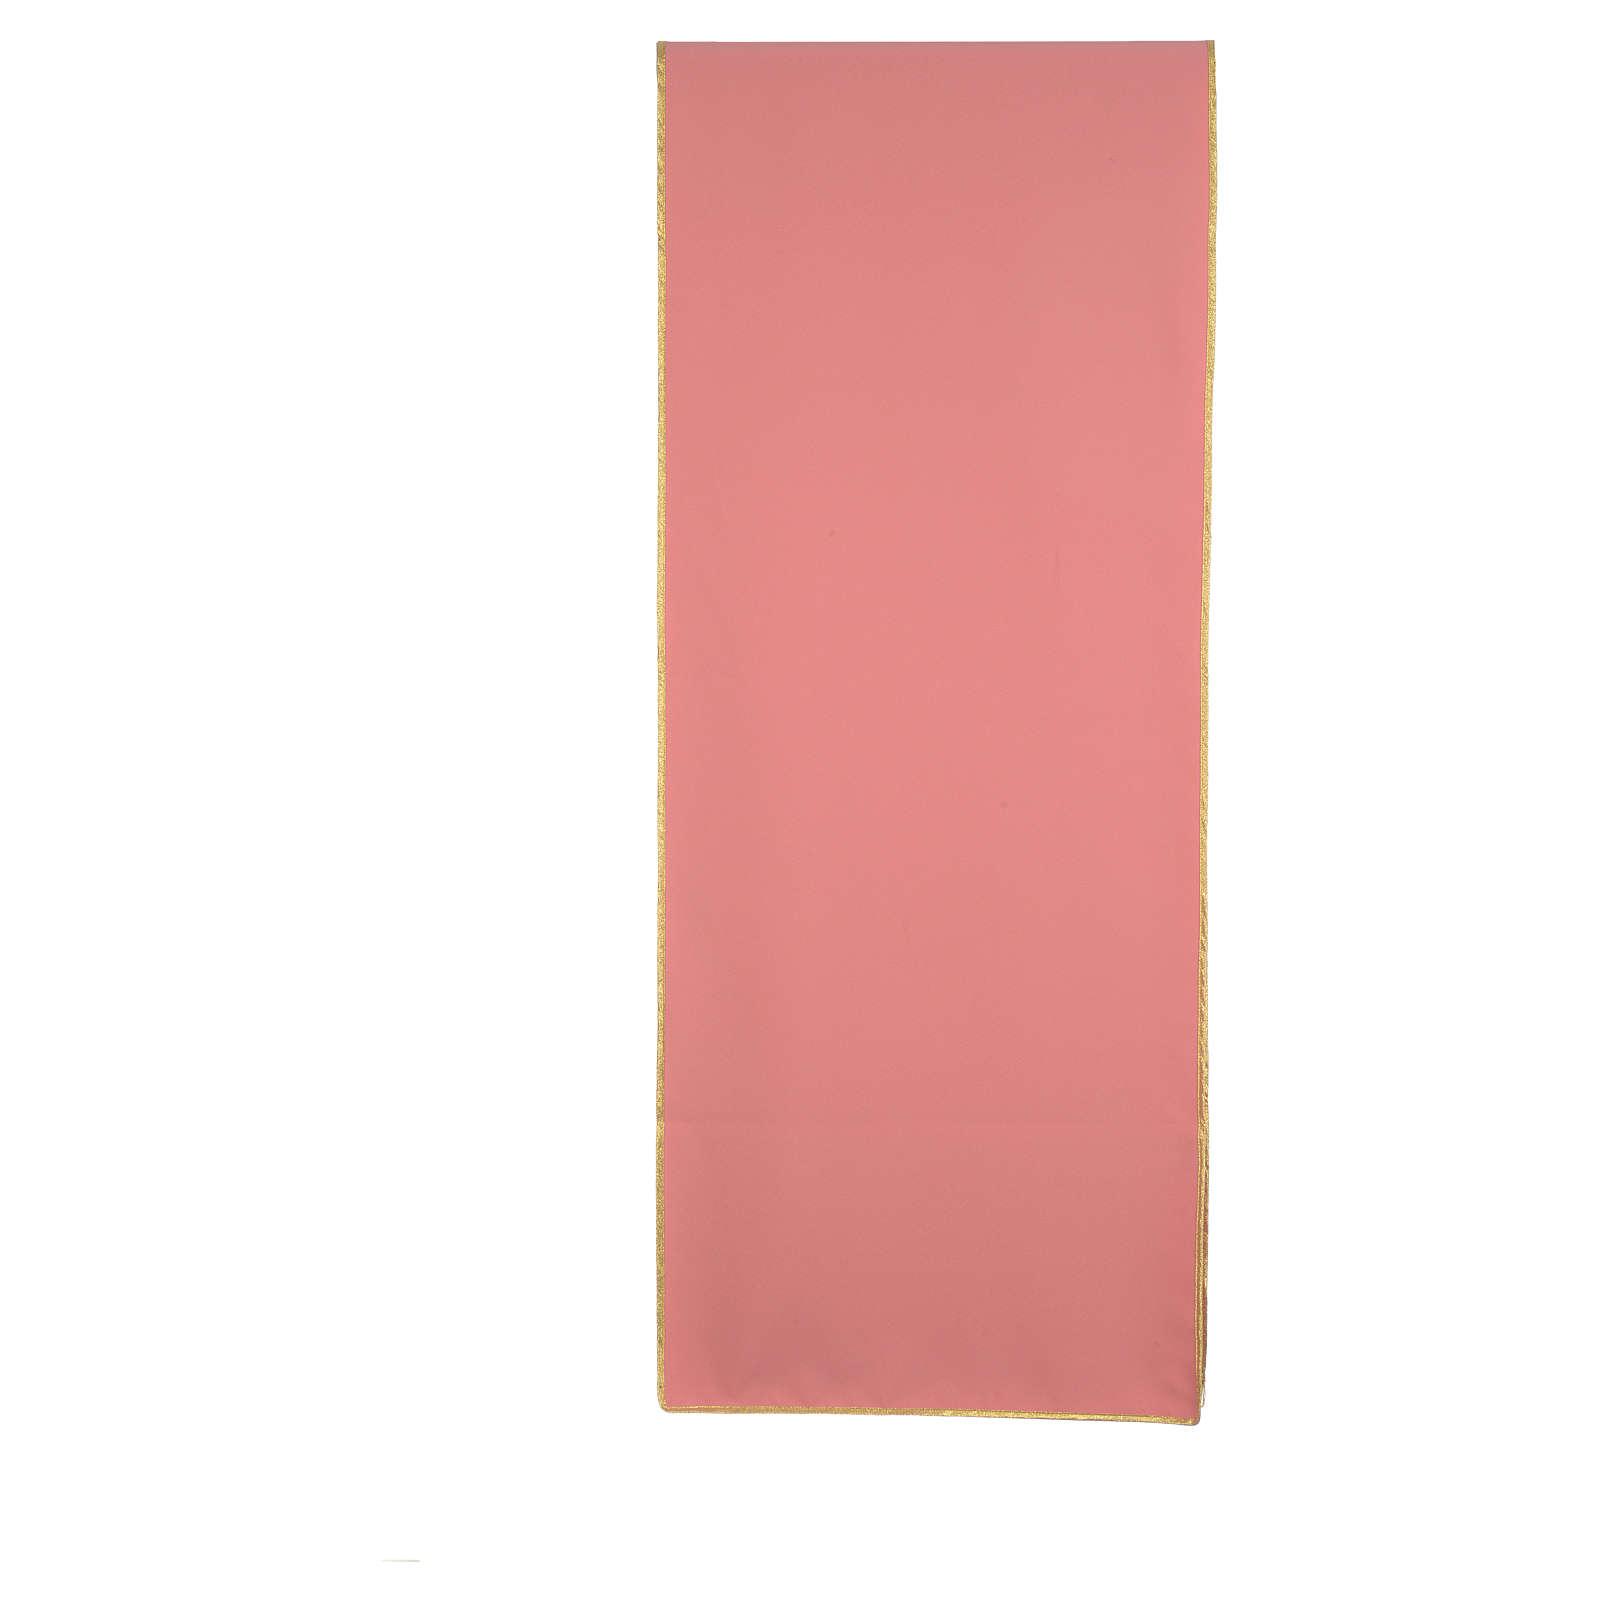 Paño de atril rosa 100% poliéster cruz estilizada IHS XP alfa omega 4